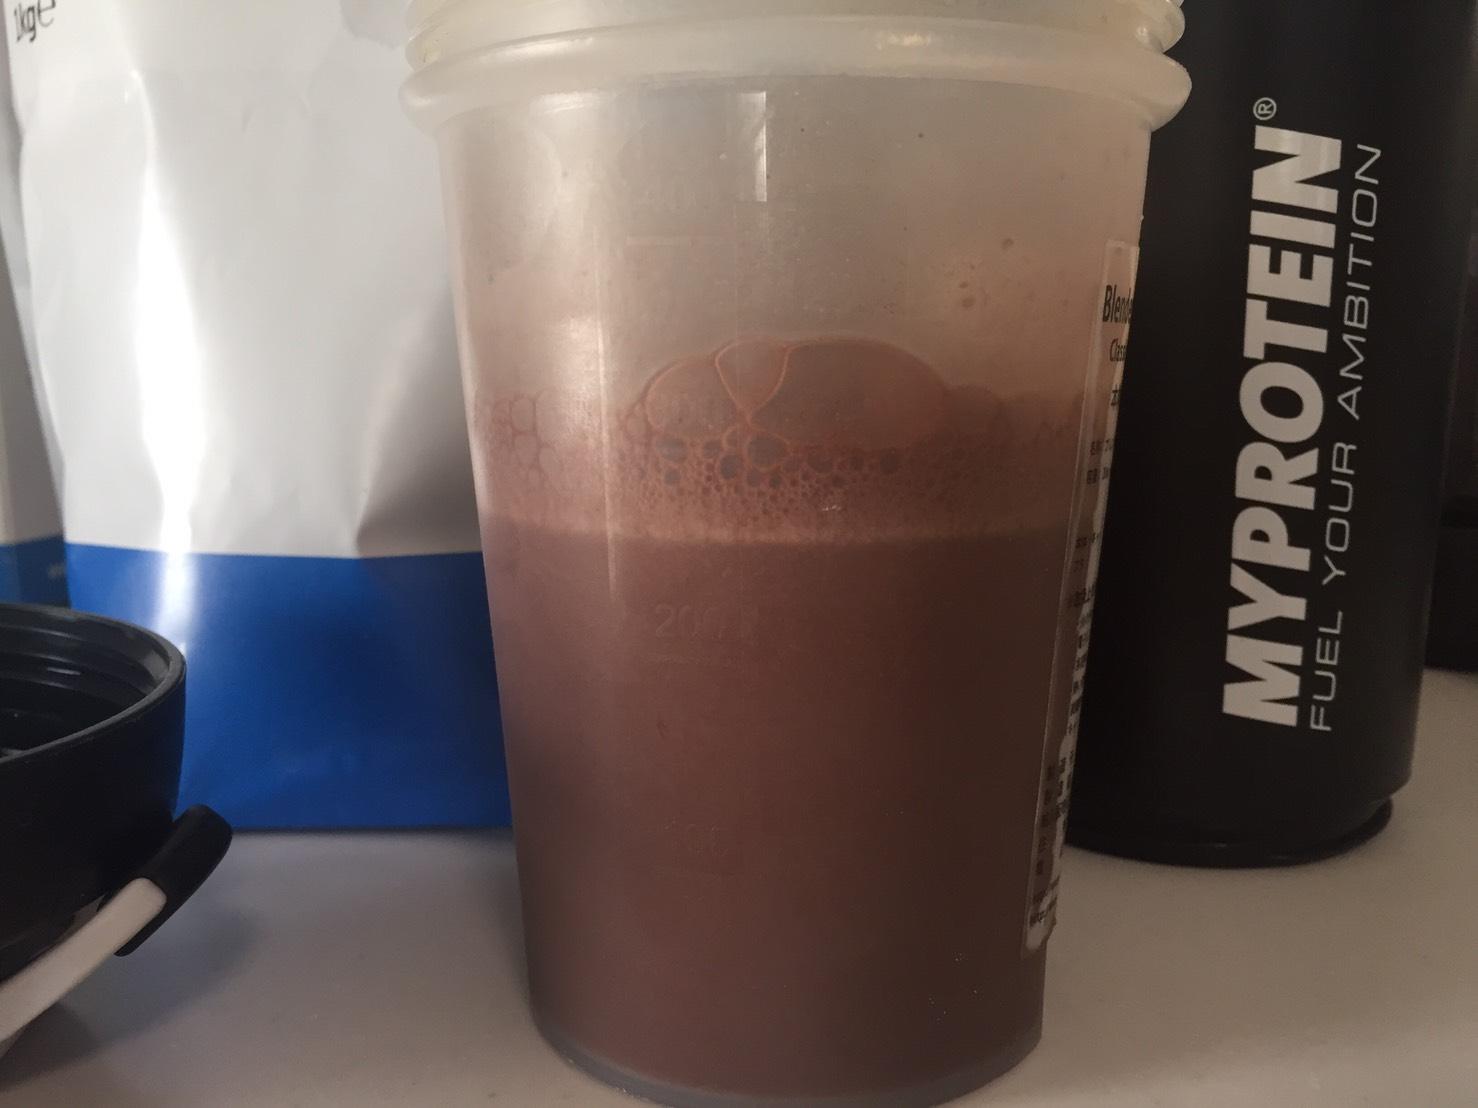 【WPI】IMPACT 分離ホエイプロテイン (アイソレート)「CHOCOLATE BROWNIE FLAVOUR(チョコレートブラウニー味)」を横から撮影した様子